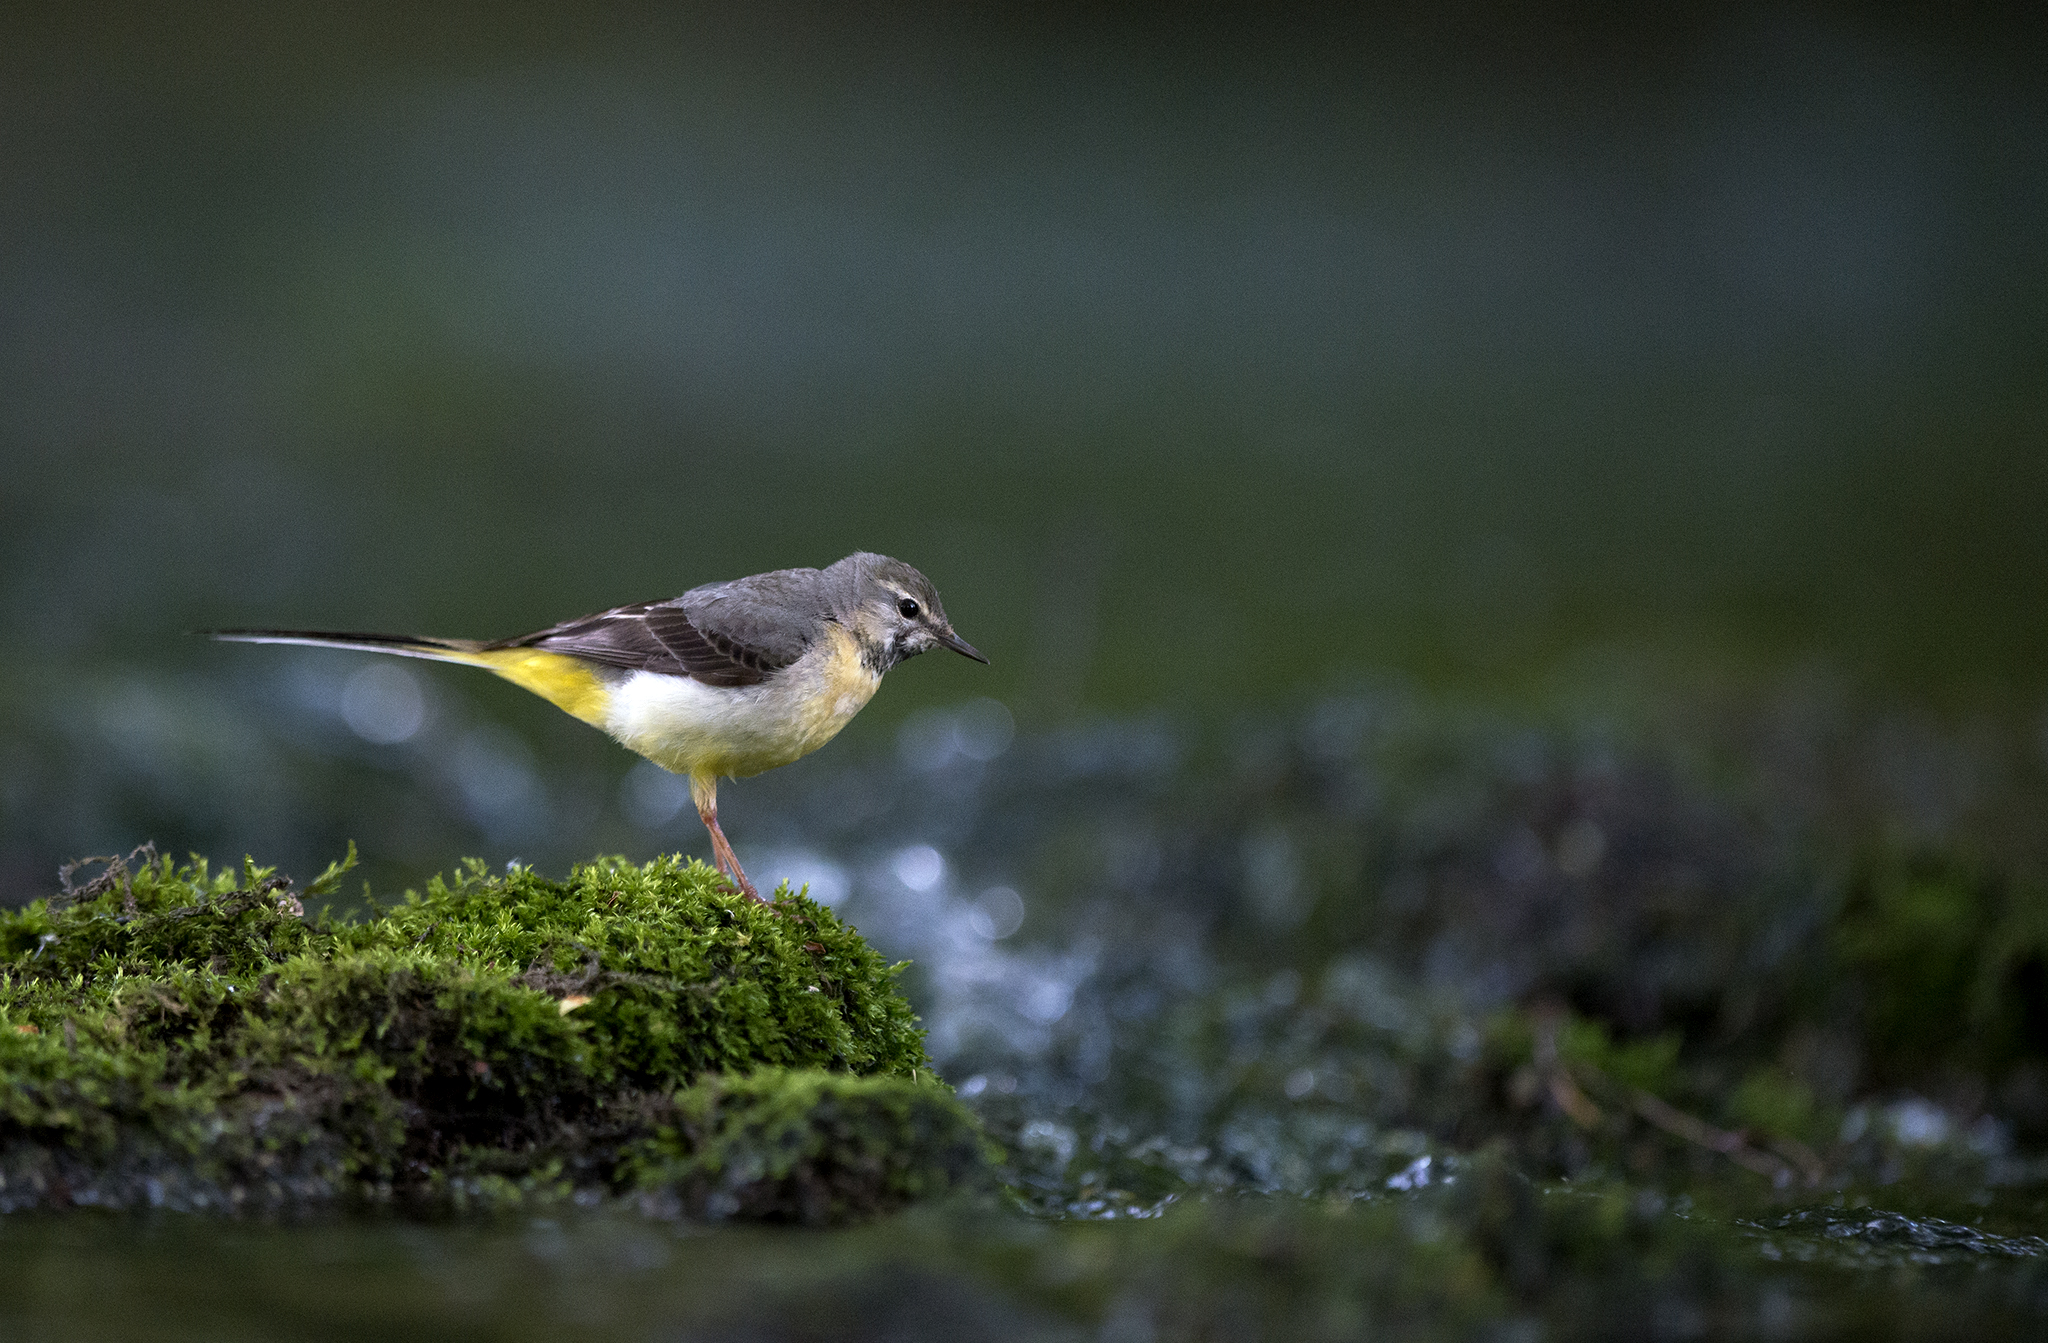 Bergeronnette des ruisseaux Motacilla cinerea – Grey Wagtail